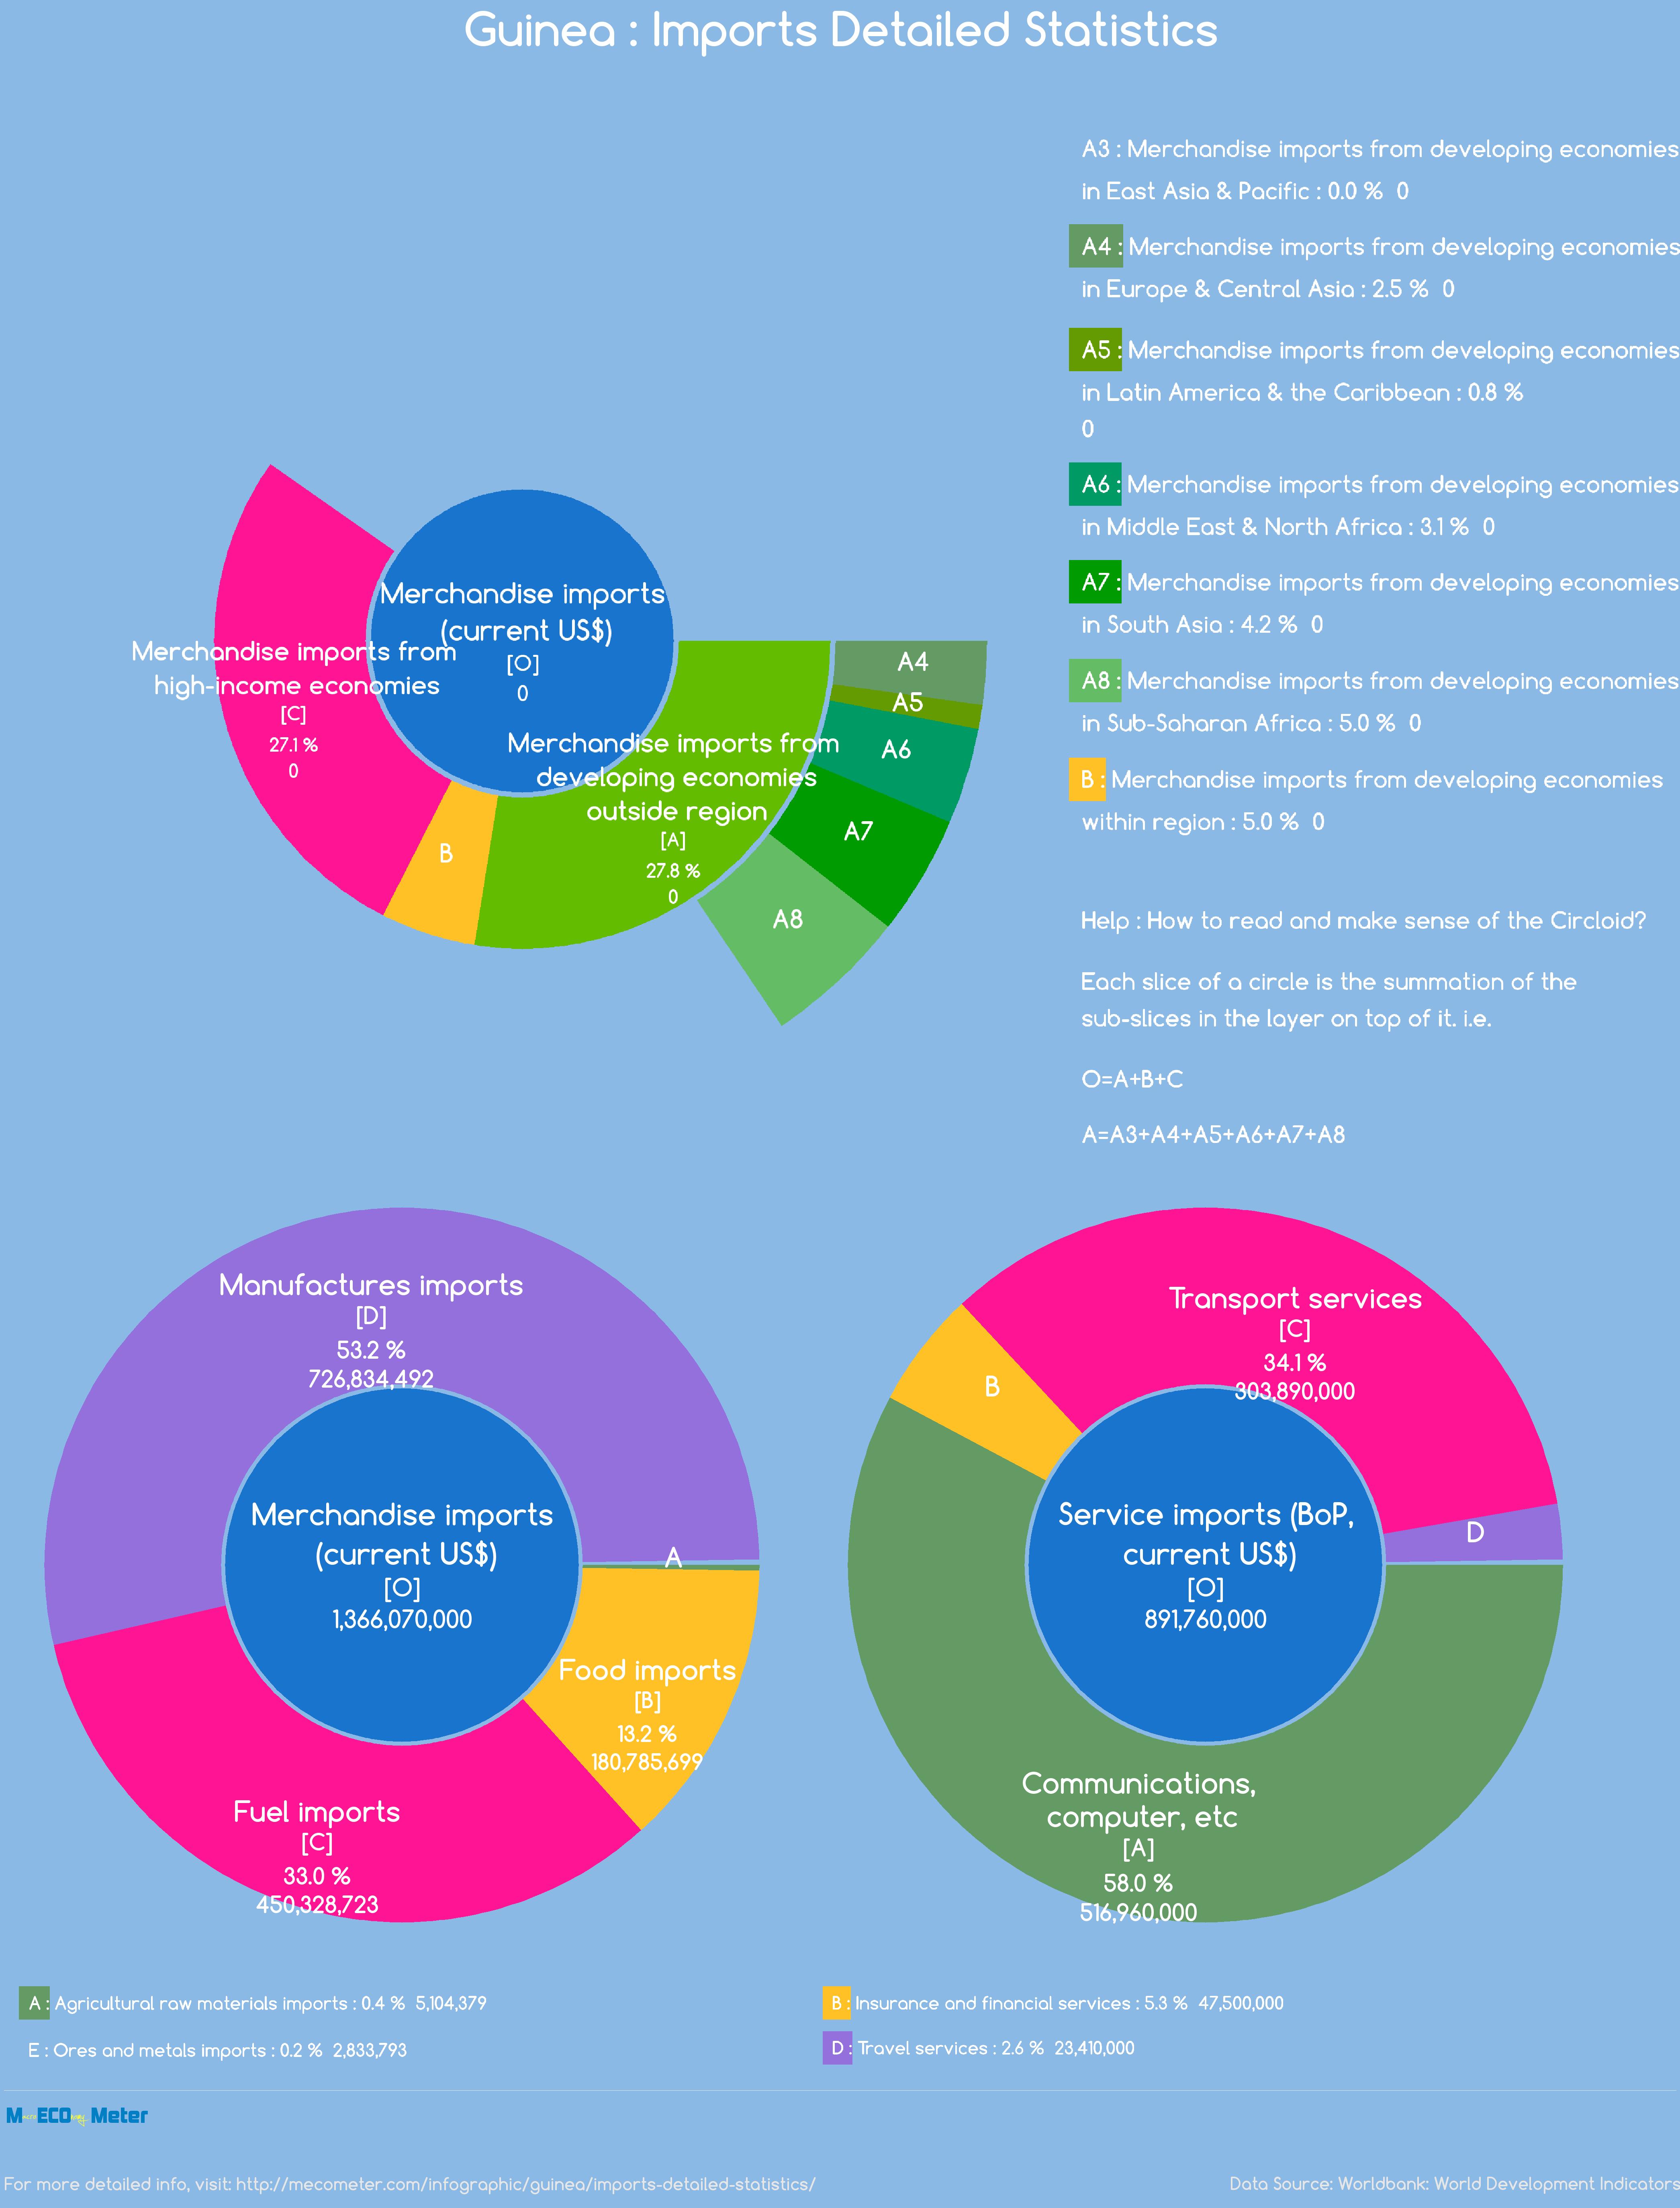 Guinea : Imports Detailed Statistics